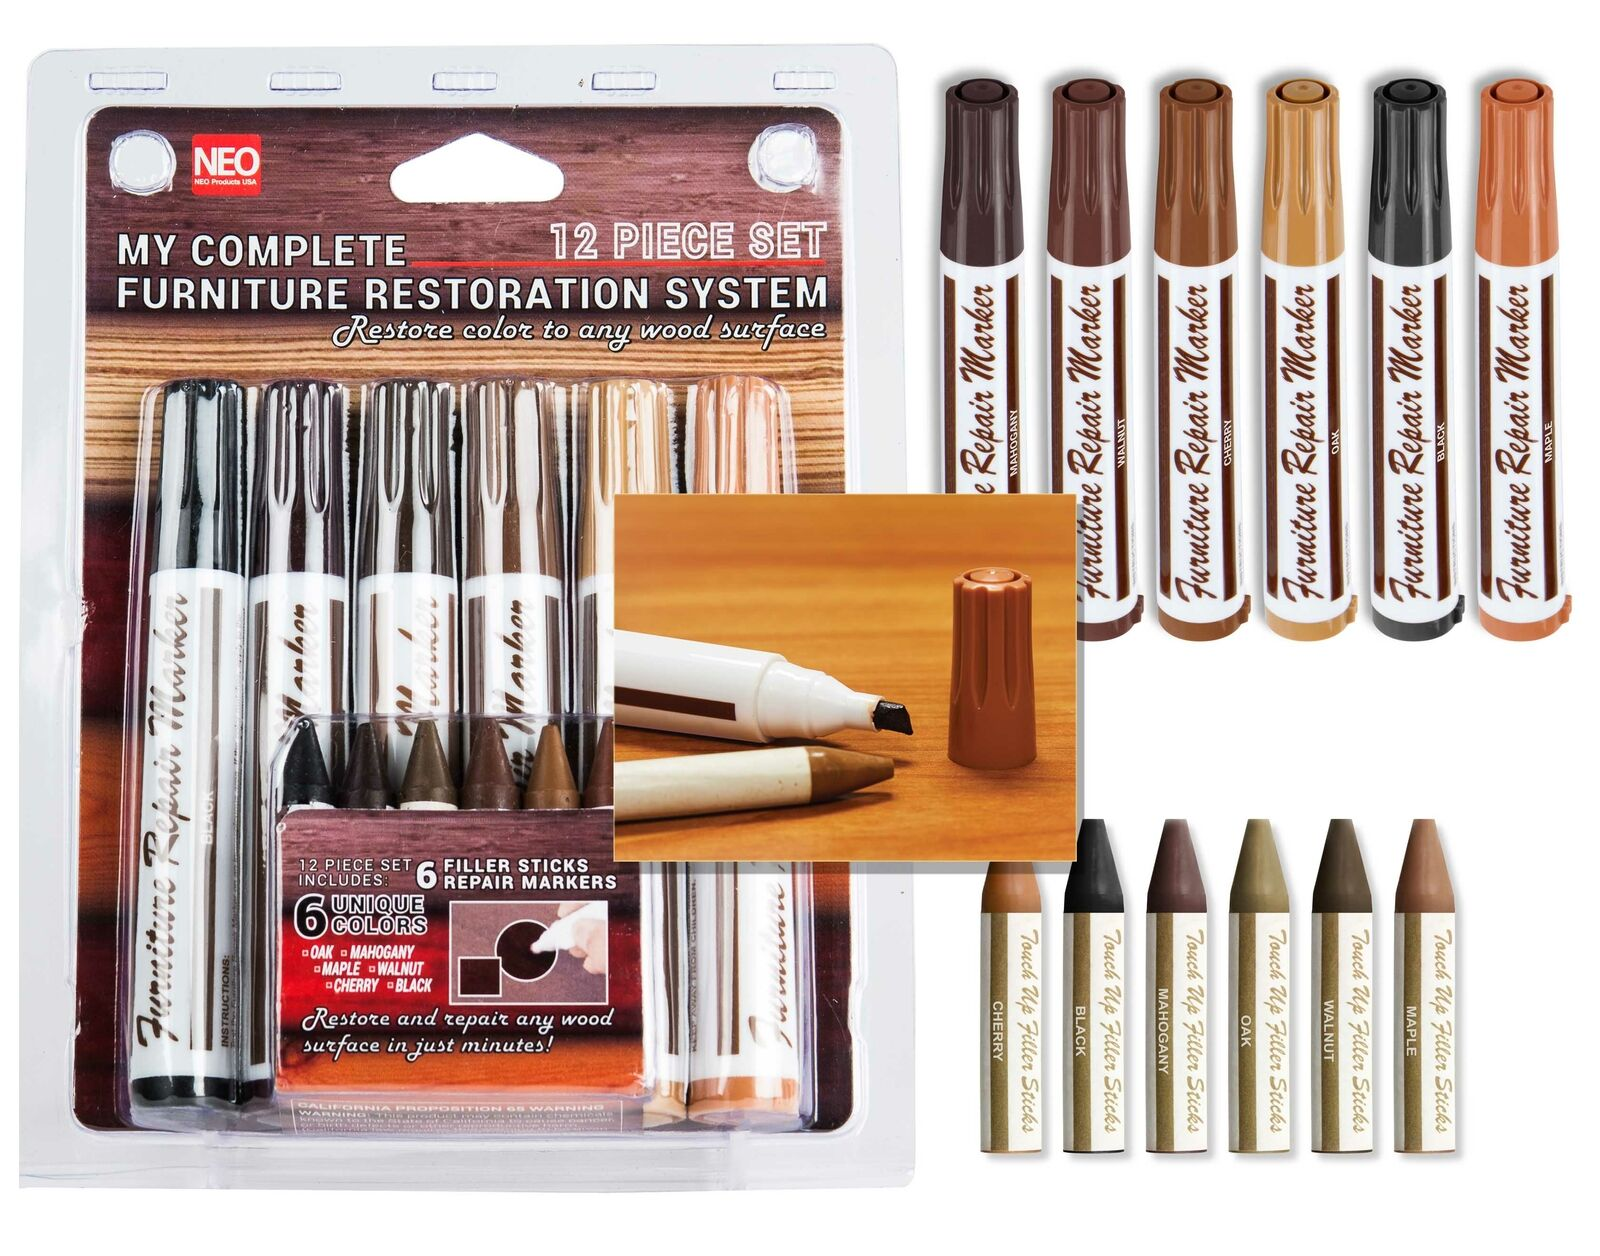 12 Pc Furniture Restoration Wood Stain Markers Set with Filler Sticks